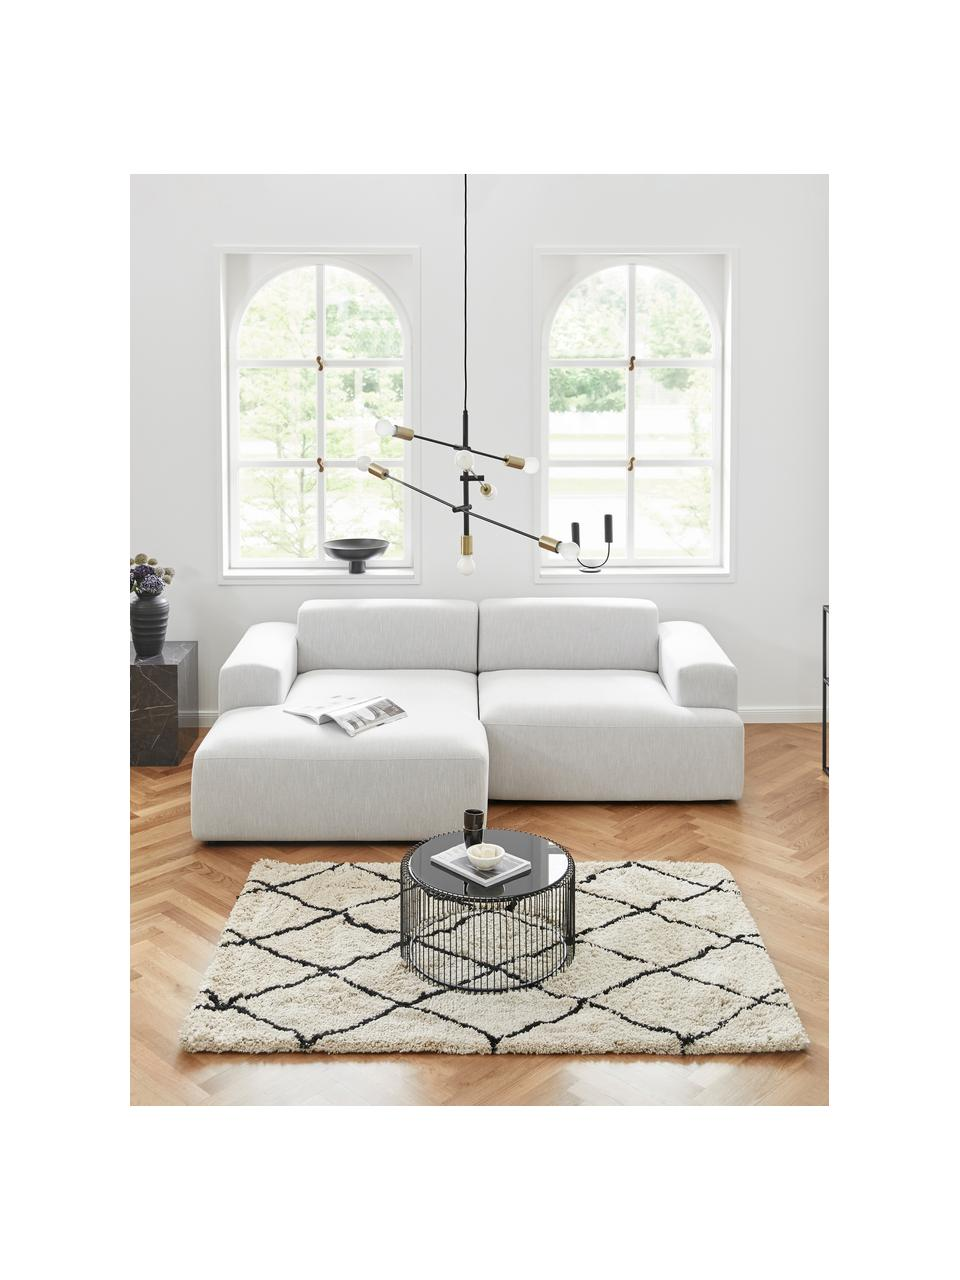 Canapé d'angle 3places gris clair Melva, Tissu gris clair